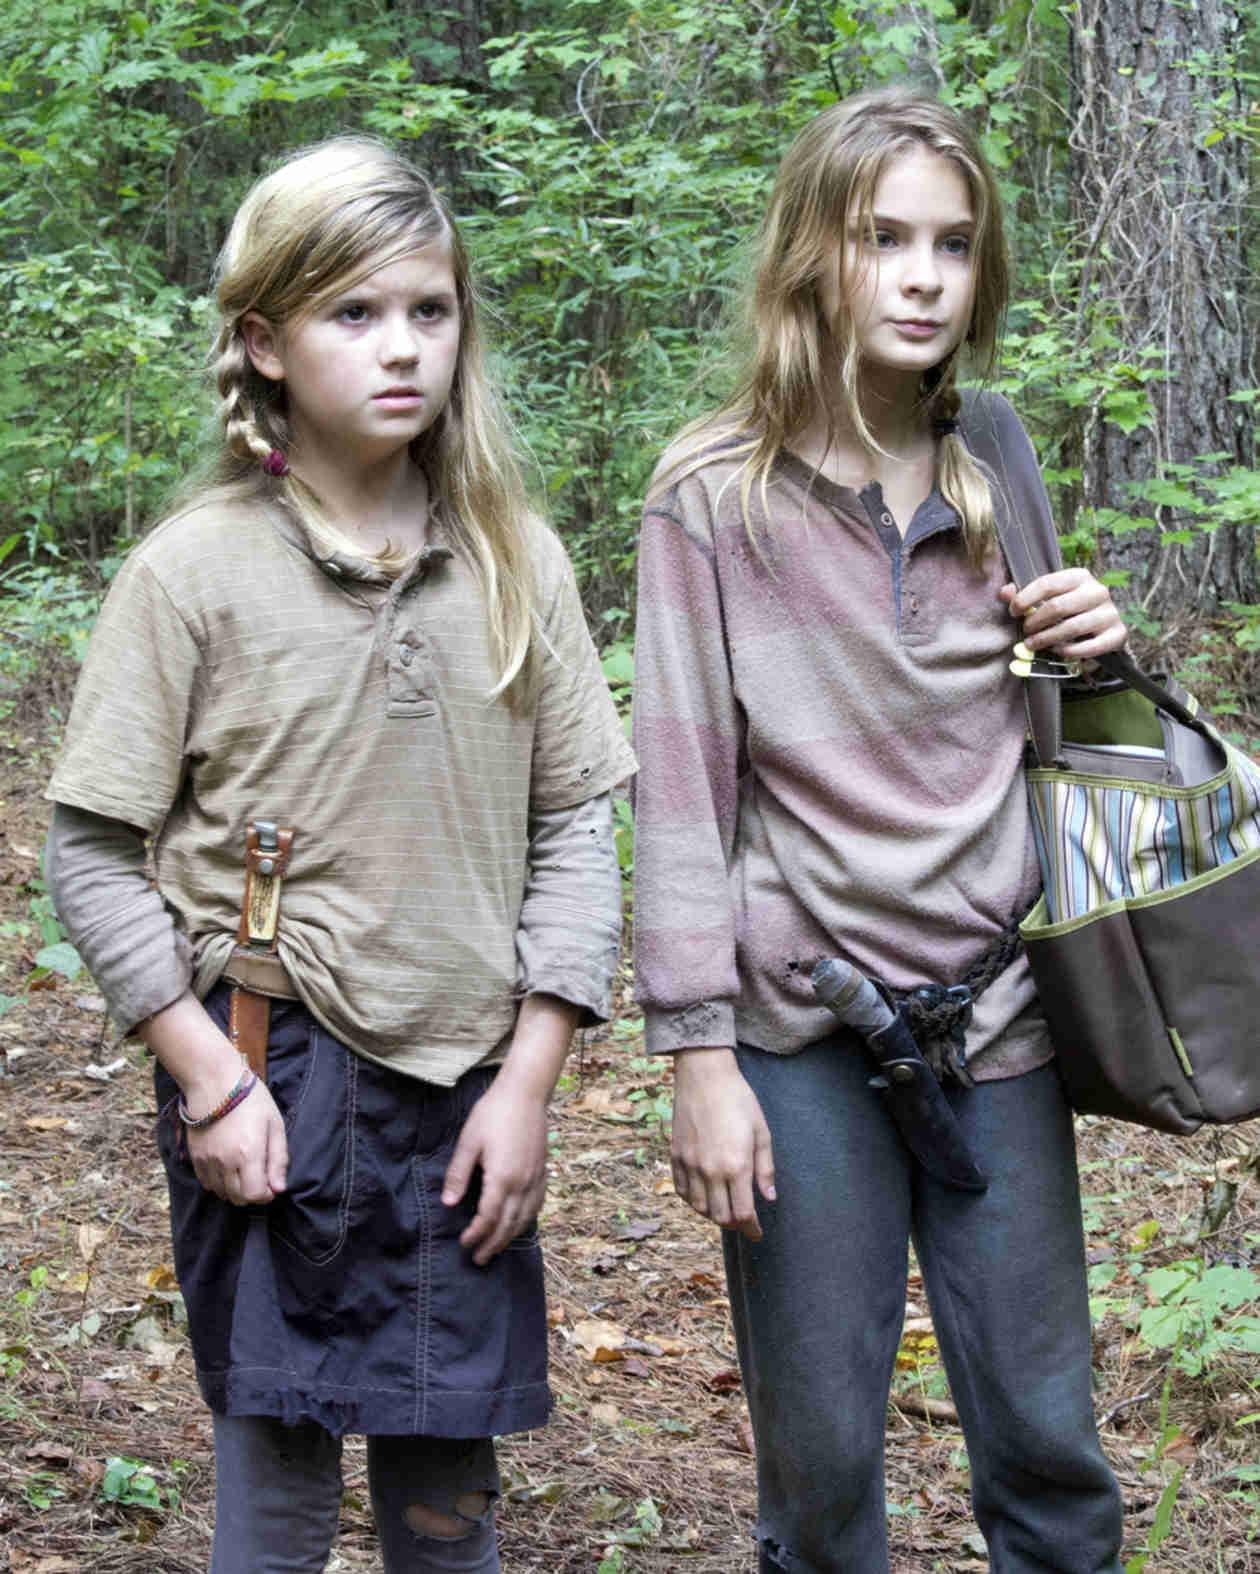 The Walking Dead Season 5: Treatment of Children Will Change Going Forward